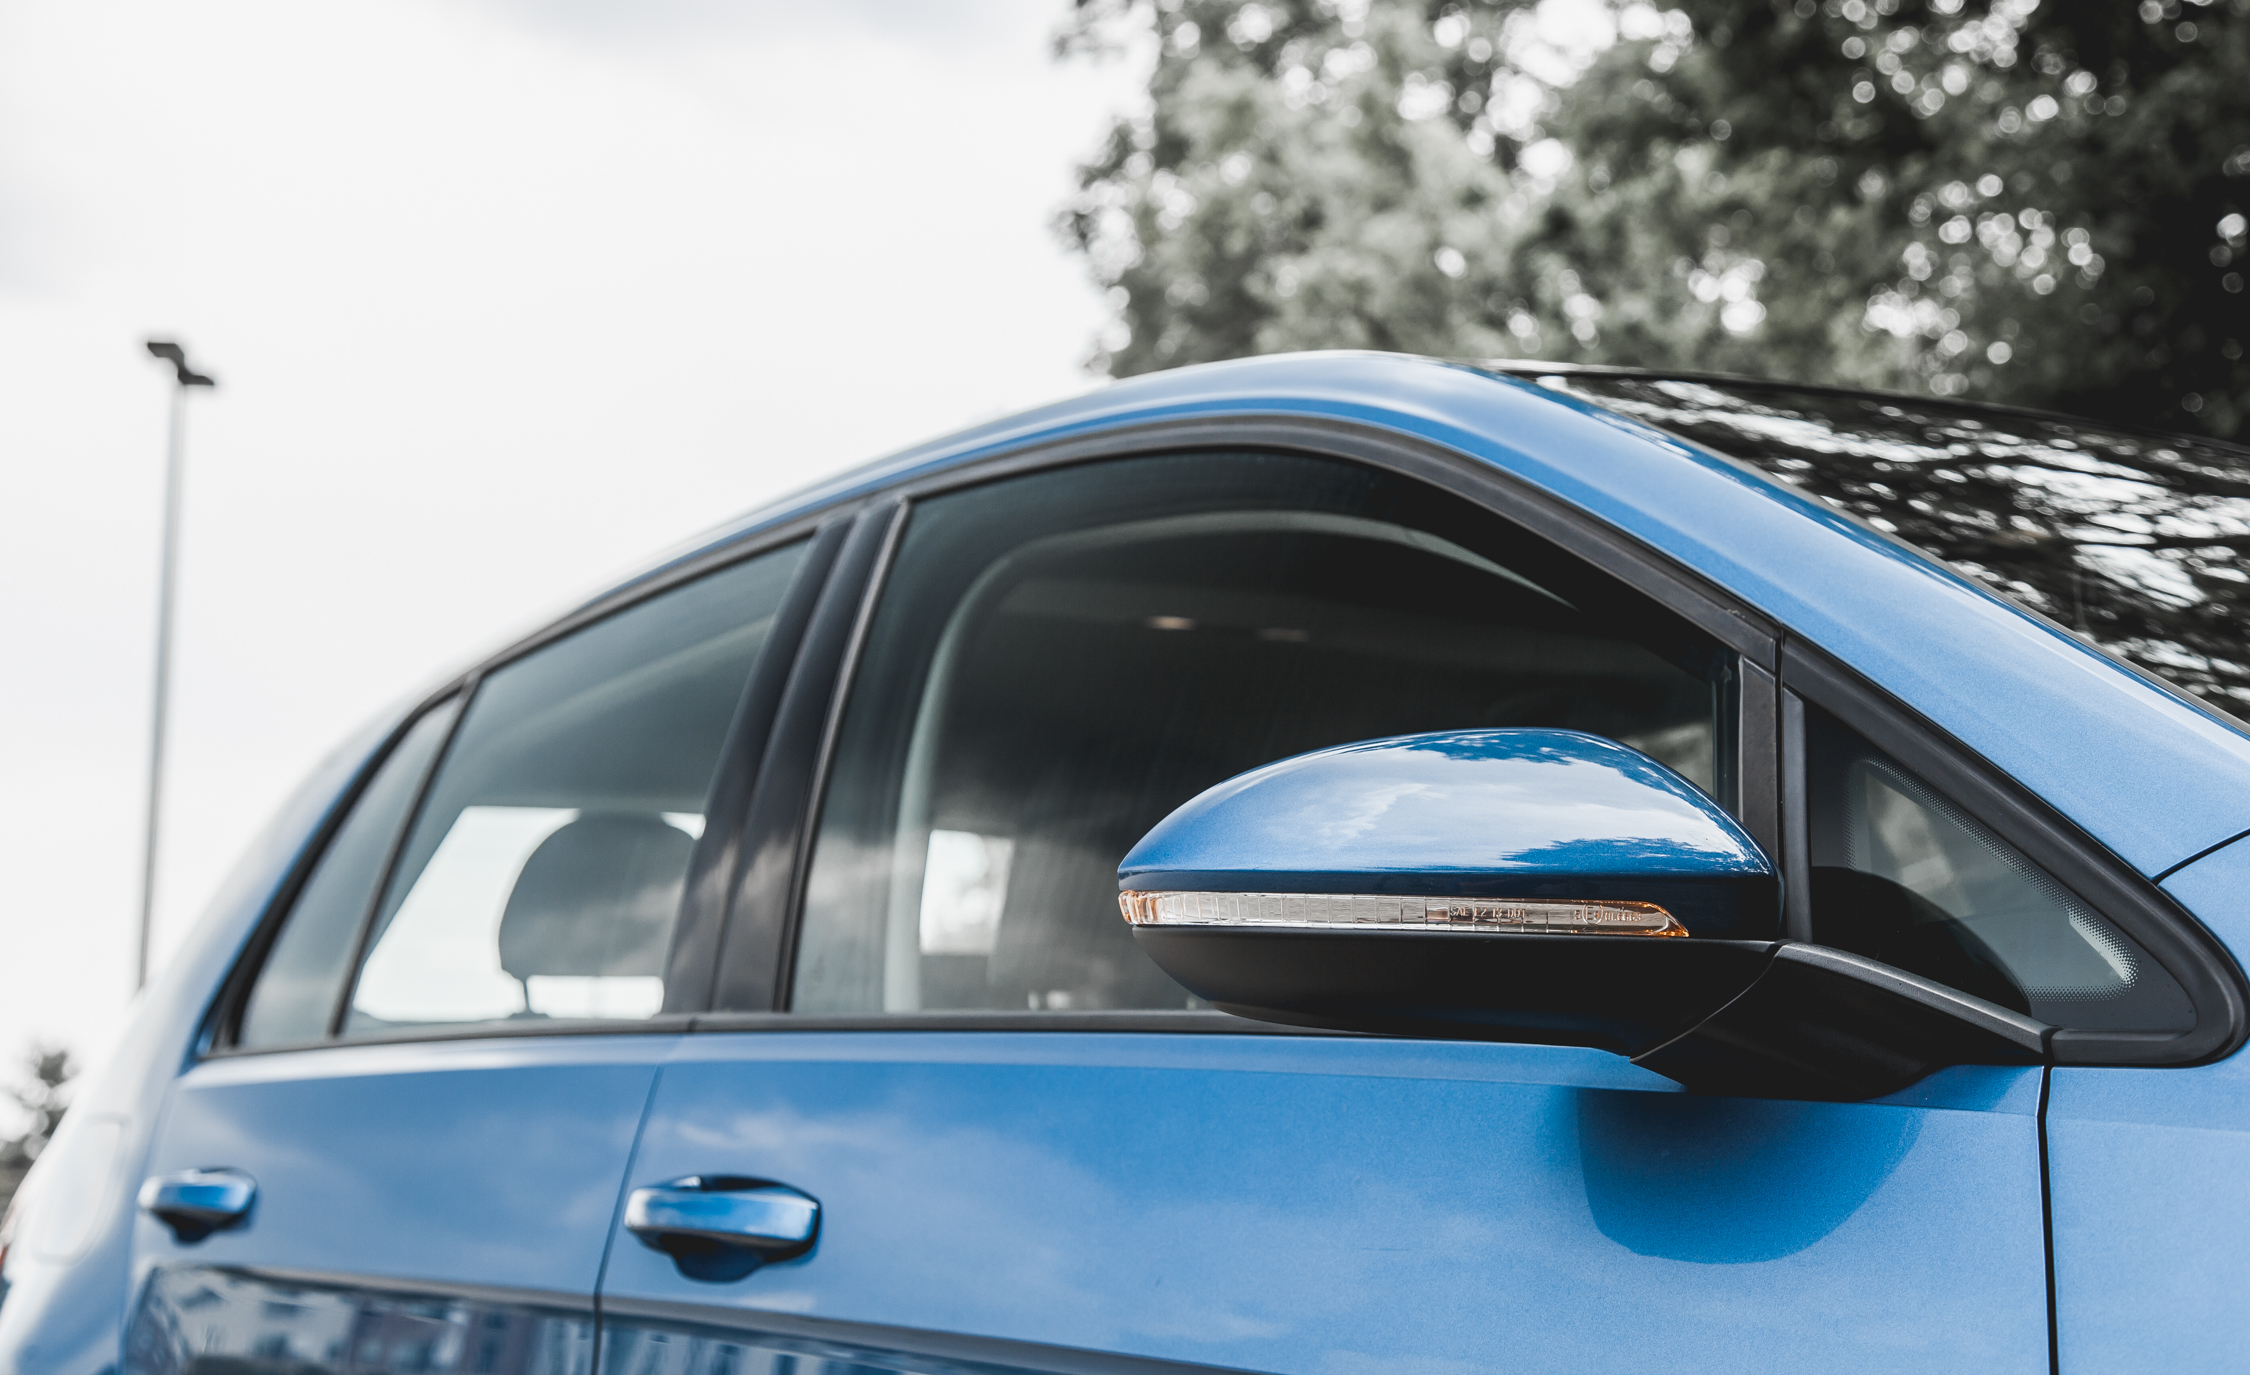 2015 Volkswagen Golf TSI Exterior Side Mirror